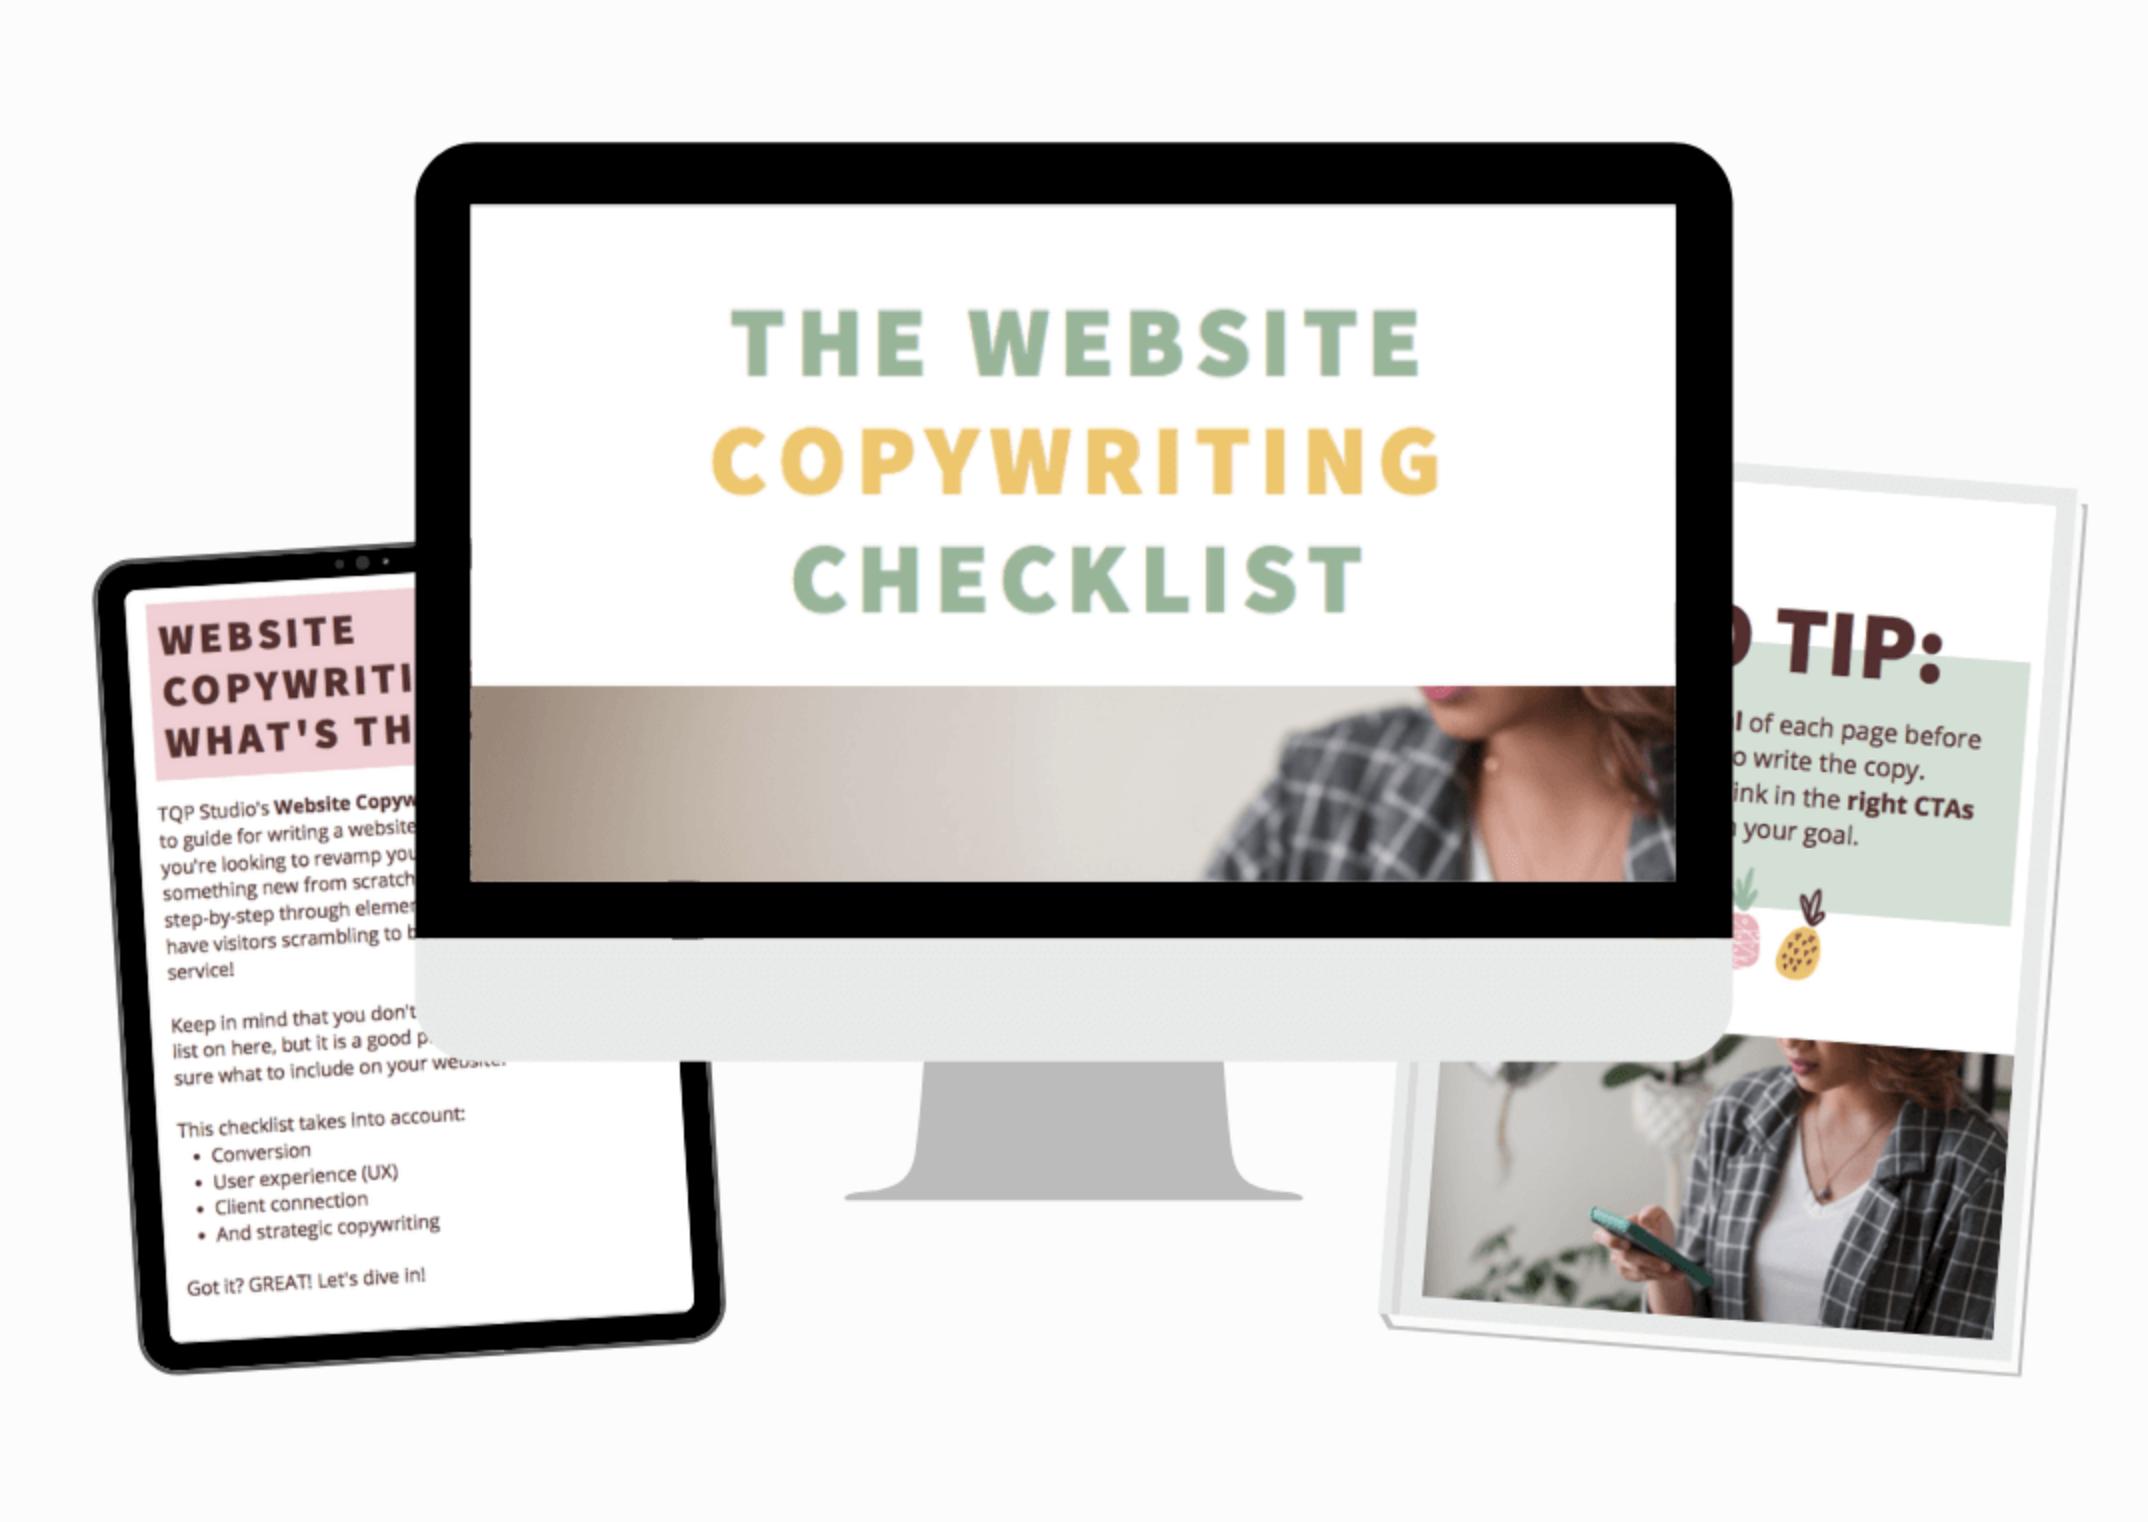 website copywriting checklist for service providers